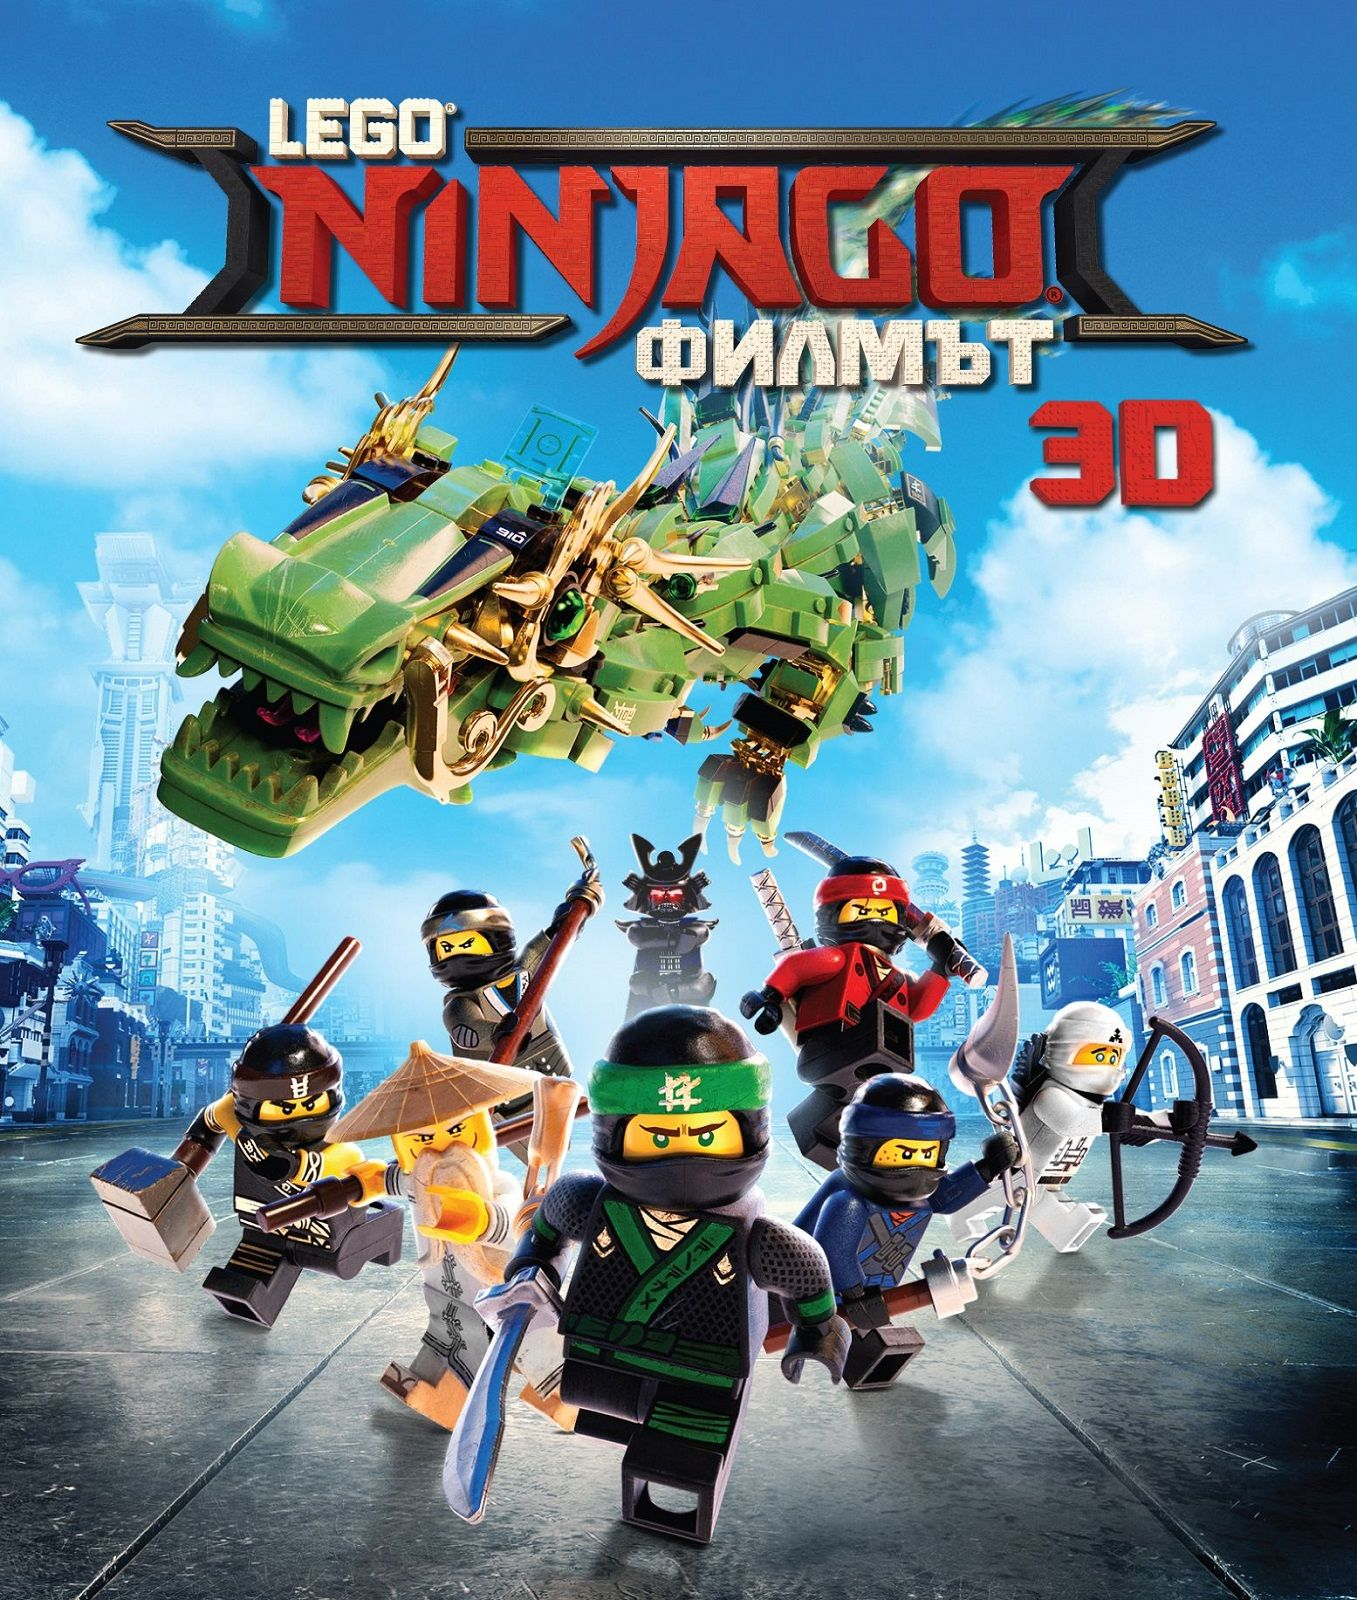 Lego Ninjago: Филмът 3D (Blu-ray) - 1